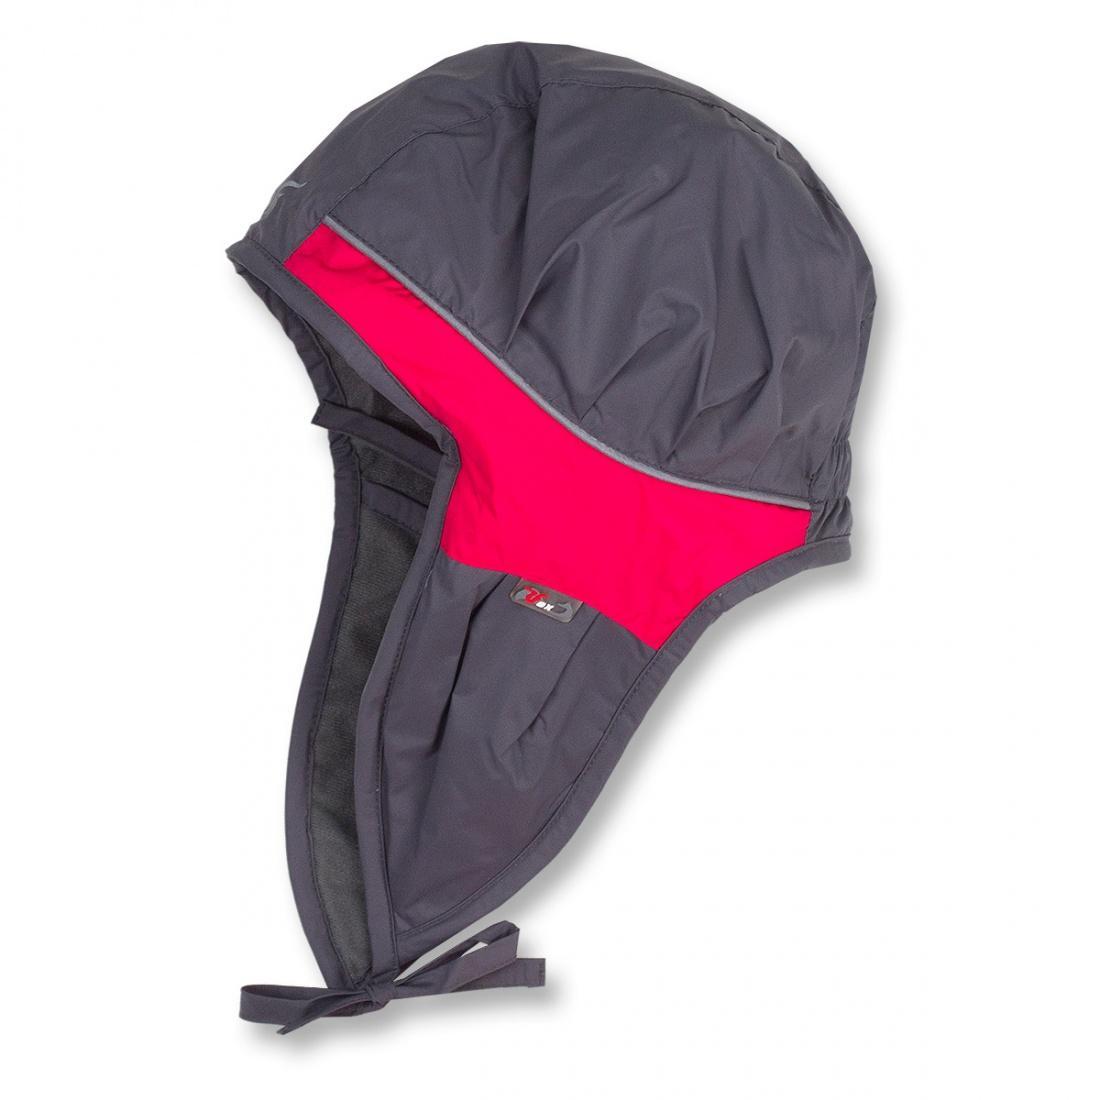 Шапка детская TressУшанки<br><br> Яркая контрастная шапочка прекрасно выделяет ребенка из толпы.<br><br> <br><br><br><br> Основной материал – Dry Factor 1000.<br><br> <br><br><br> Утеп...<br><br>Цвет: Серый<br>Размер: XL